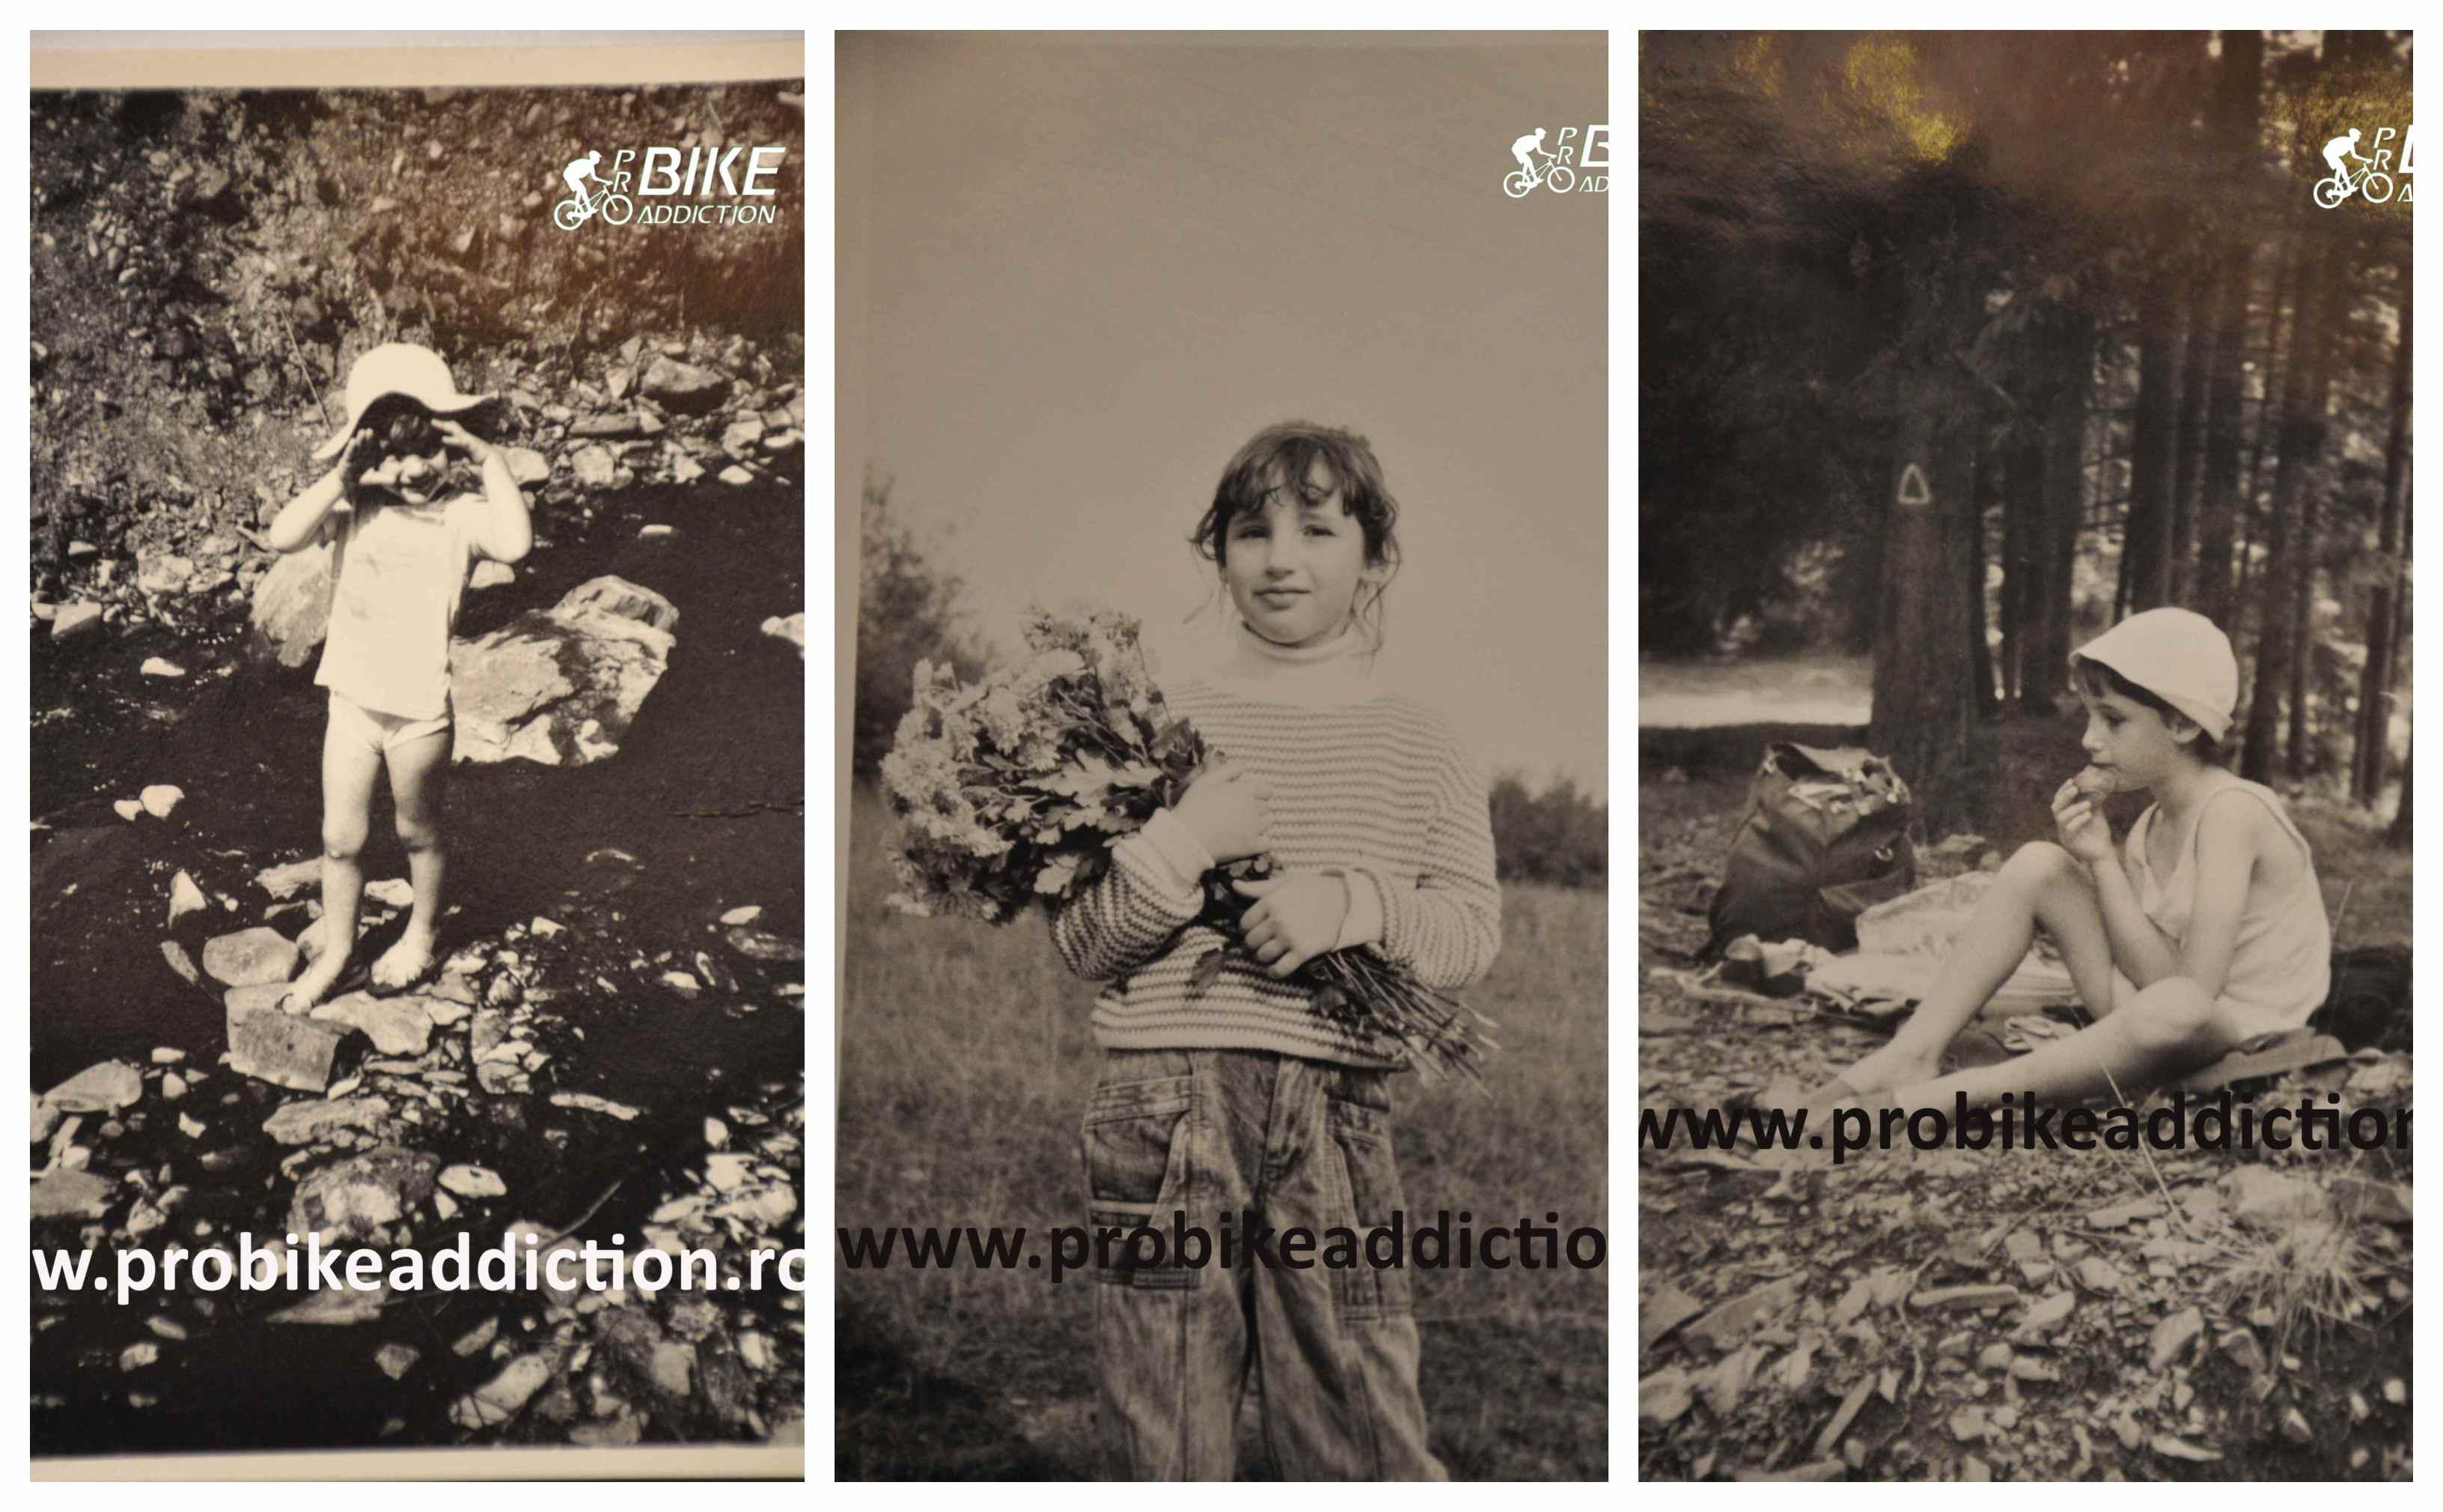 probikeaddiction munte anii 90 campulung moldovenesc